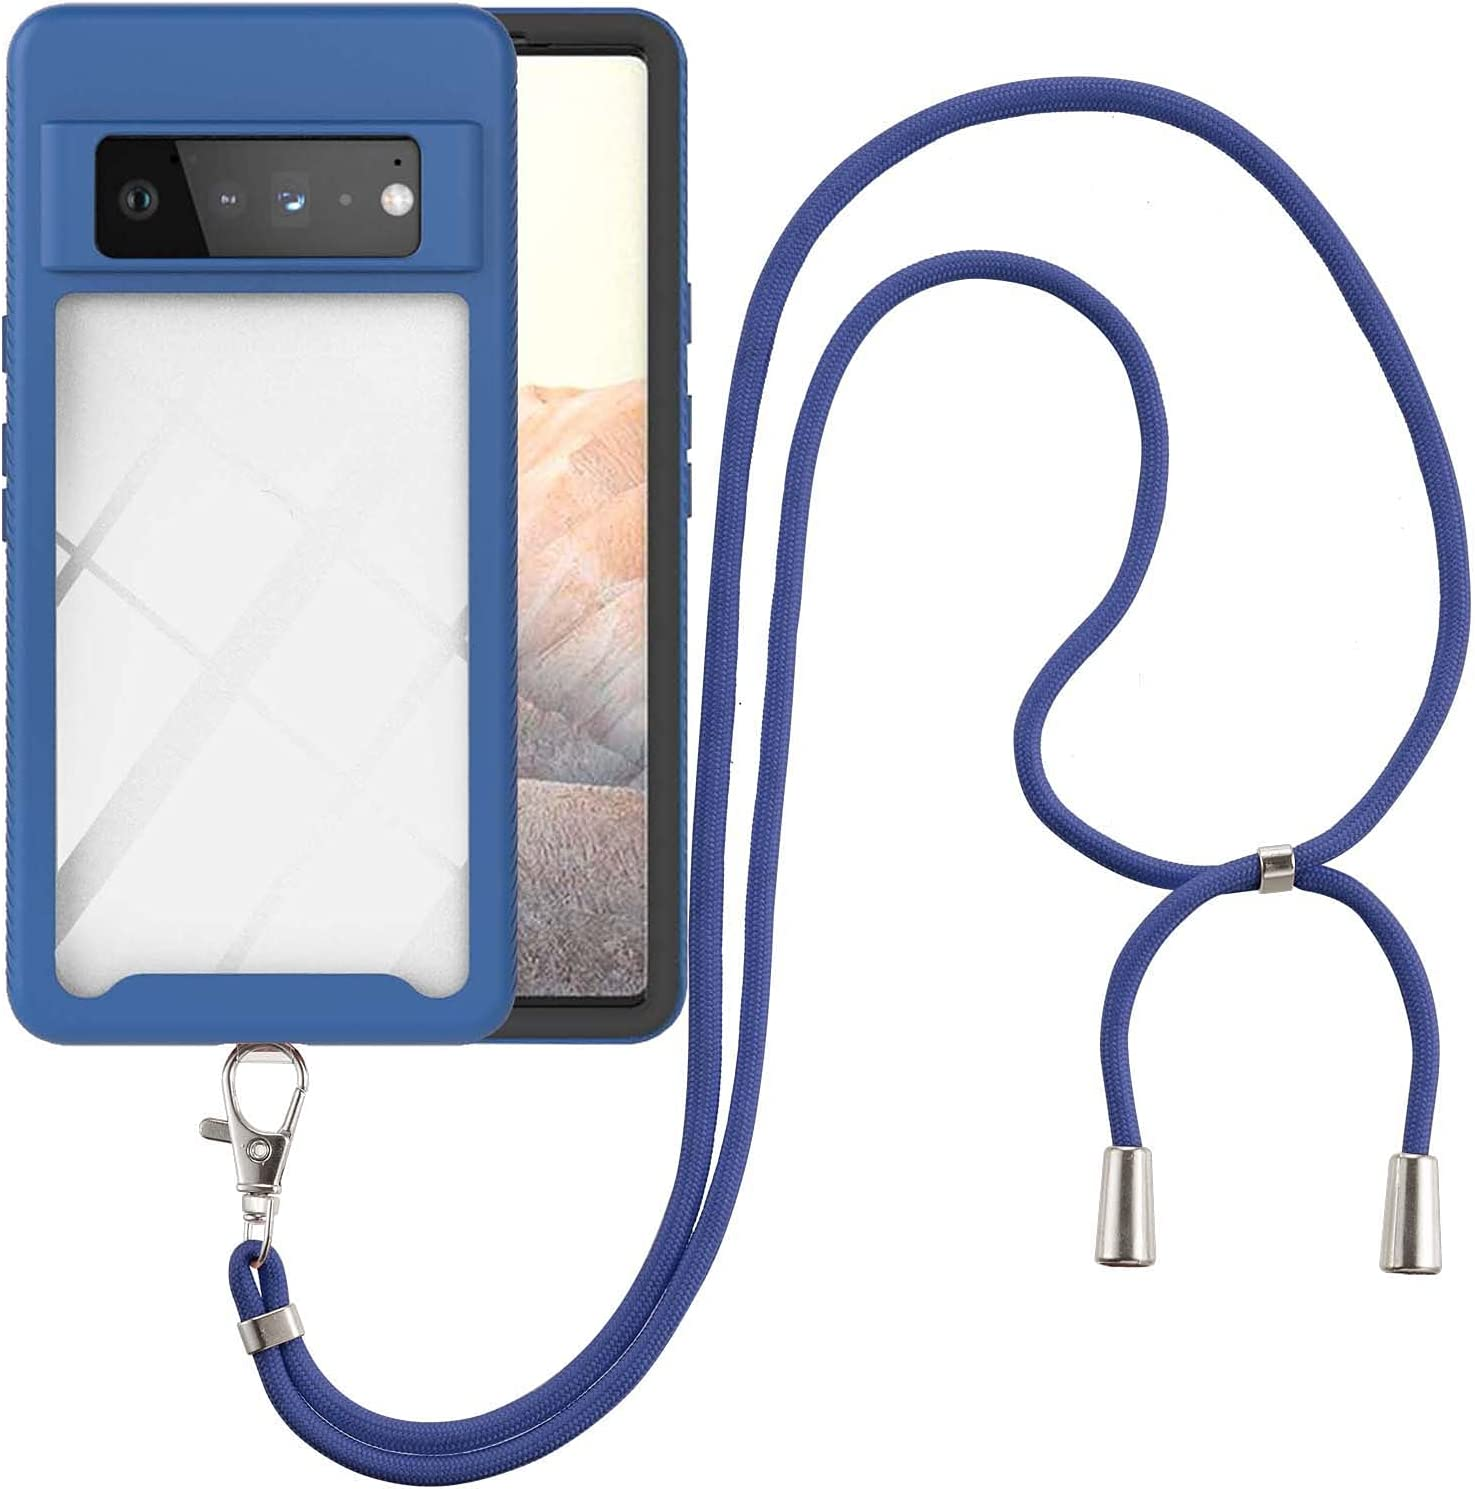 Google Pixel 6 Pro Case, EabHulie Transparent Back No-Slip Bumper with Adjustable Crossbody Lanyard Strap Case, Shockproof Full Body Protection Cover for Google Pixel 6 Pro Blue